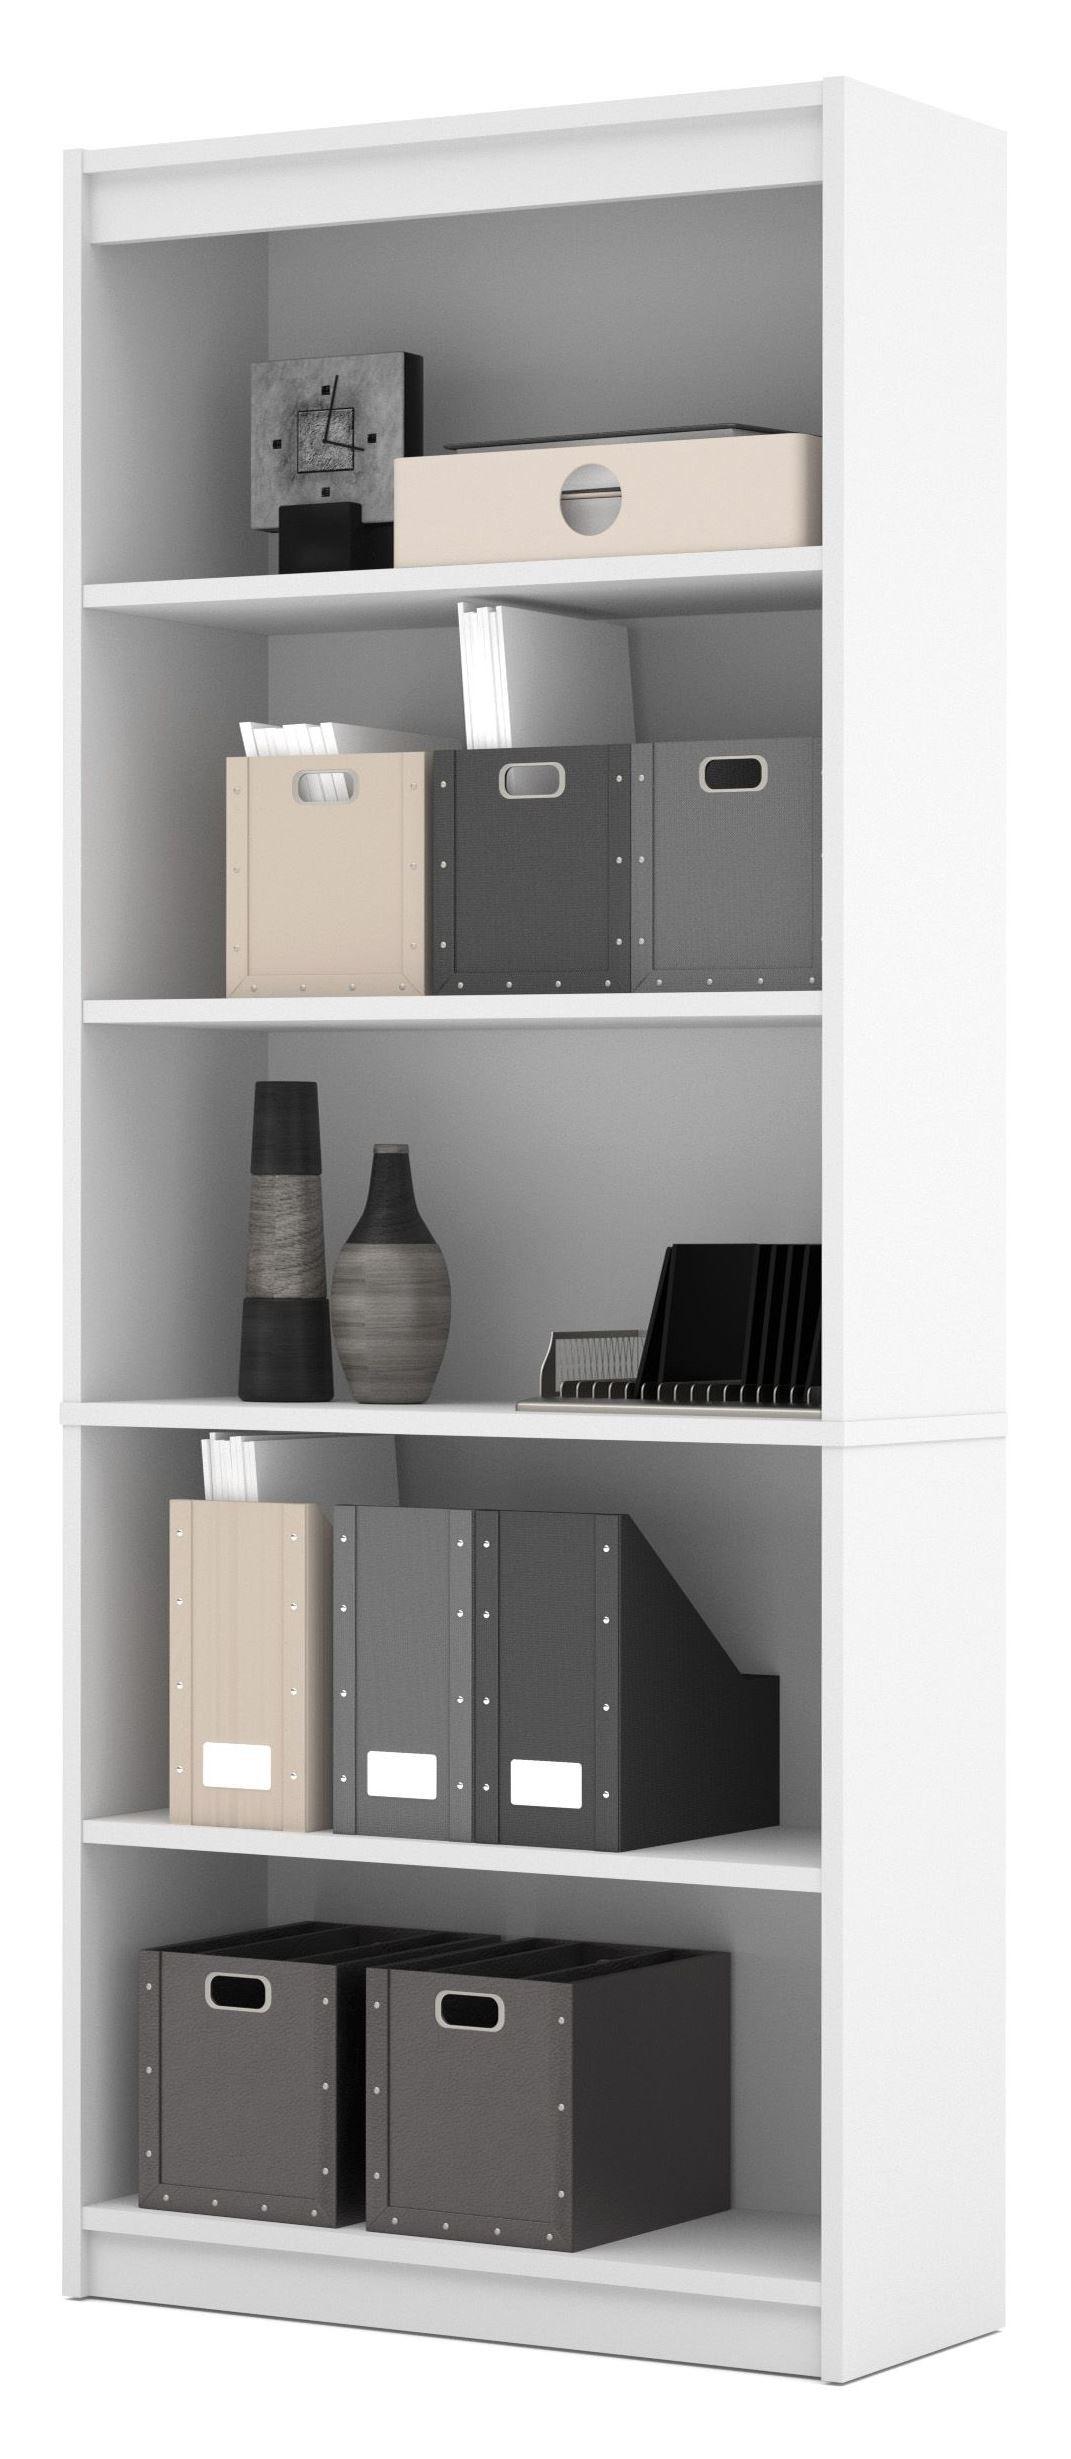 White Standard Bookcase From Bestar (65715-3117)